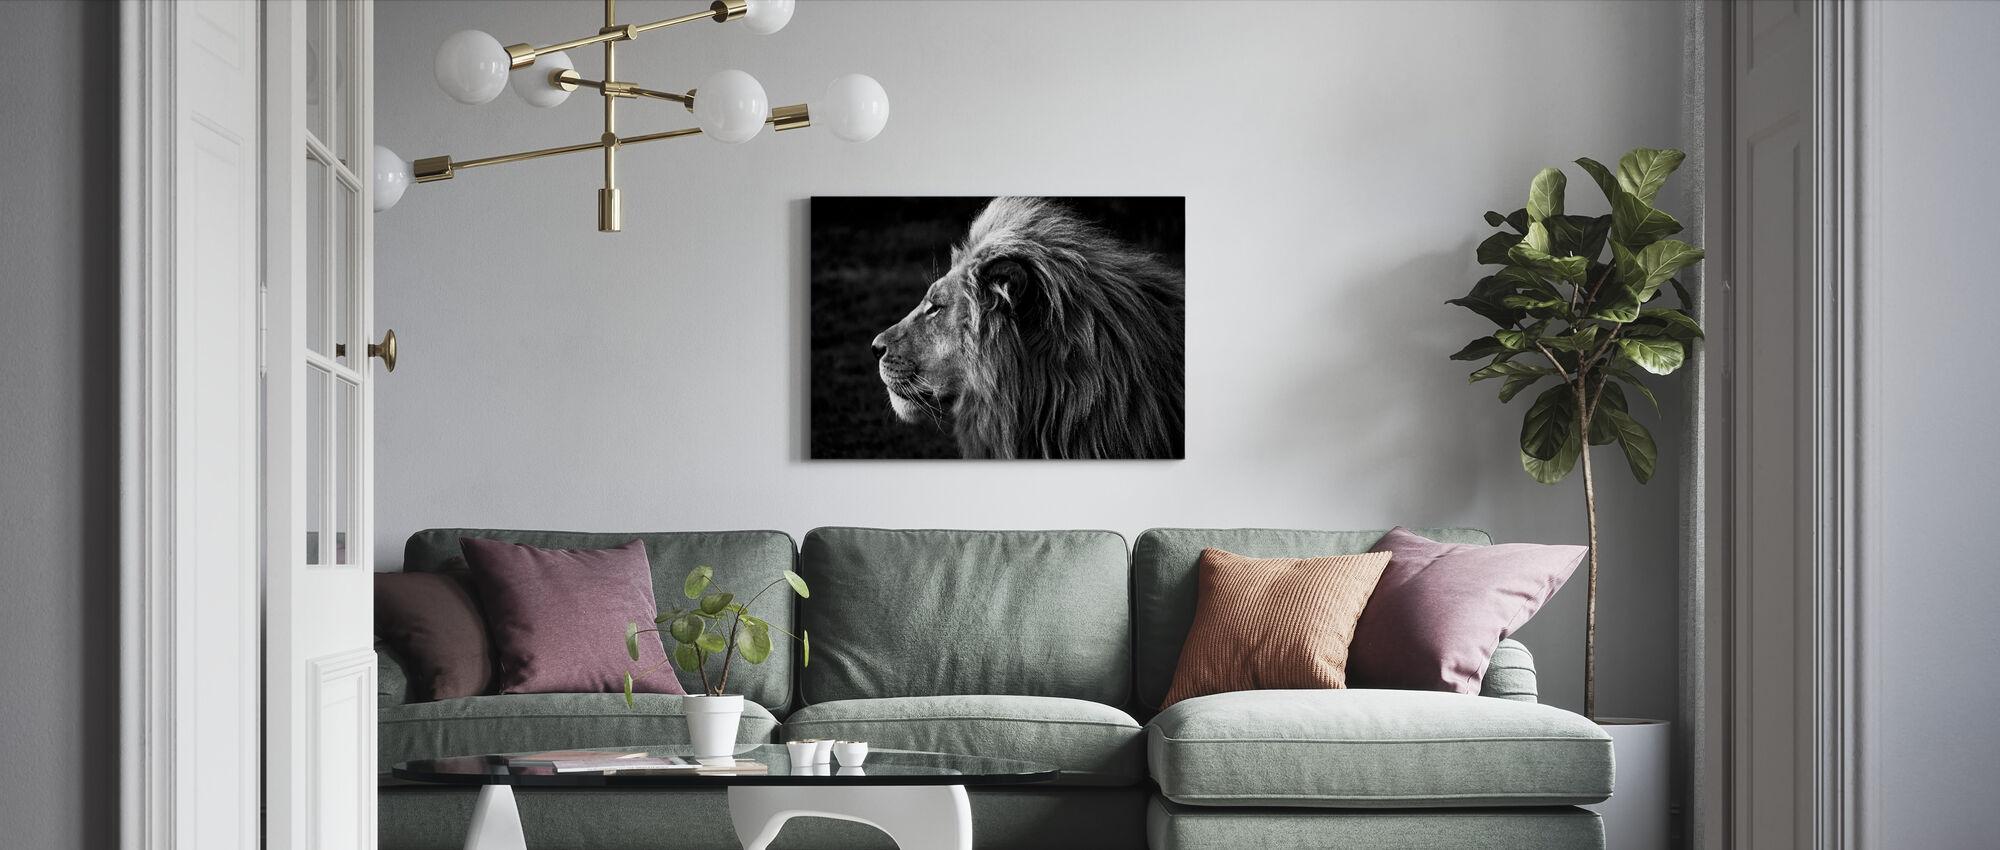 Leeuw - Canvas print - Woonkamer